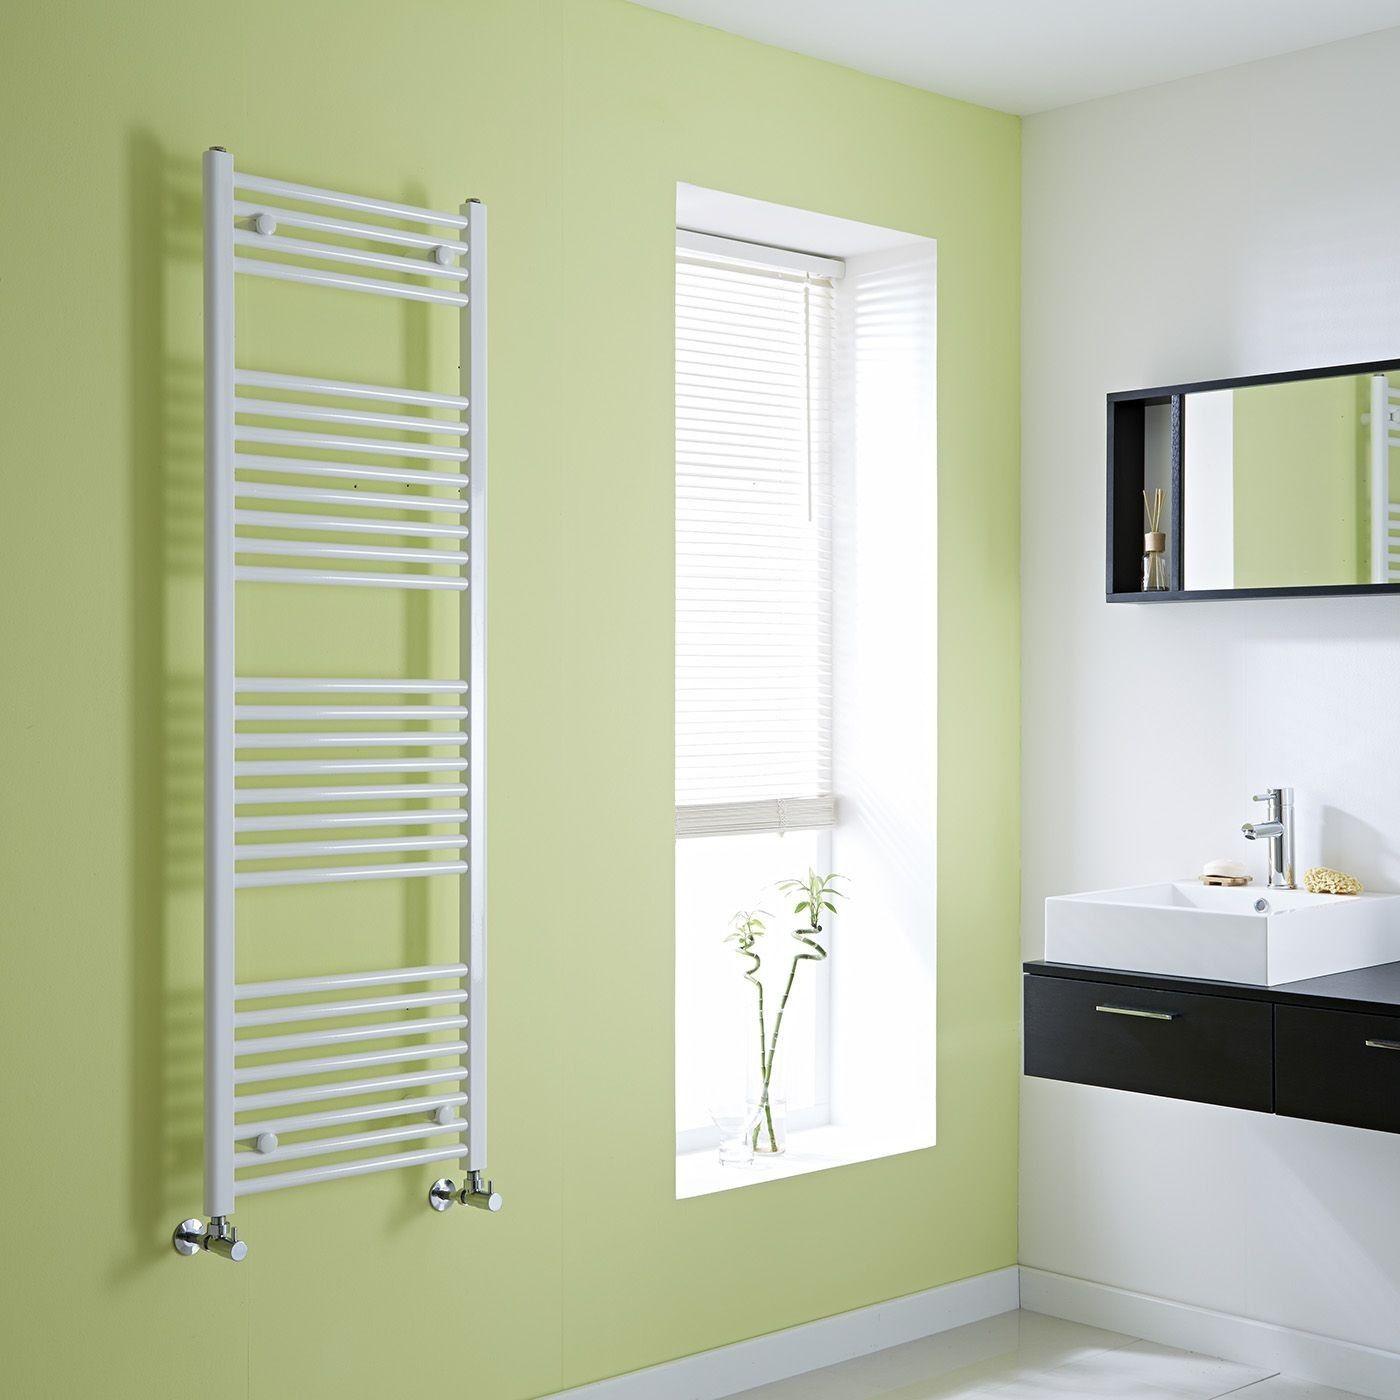 Milano Calder  Flat White Heated Towel Rail 1500Mm X 500Mm Beauteous Designer Heated Towel Rails For Bathrooms Decorating Inspiration